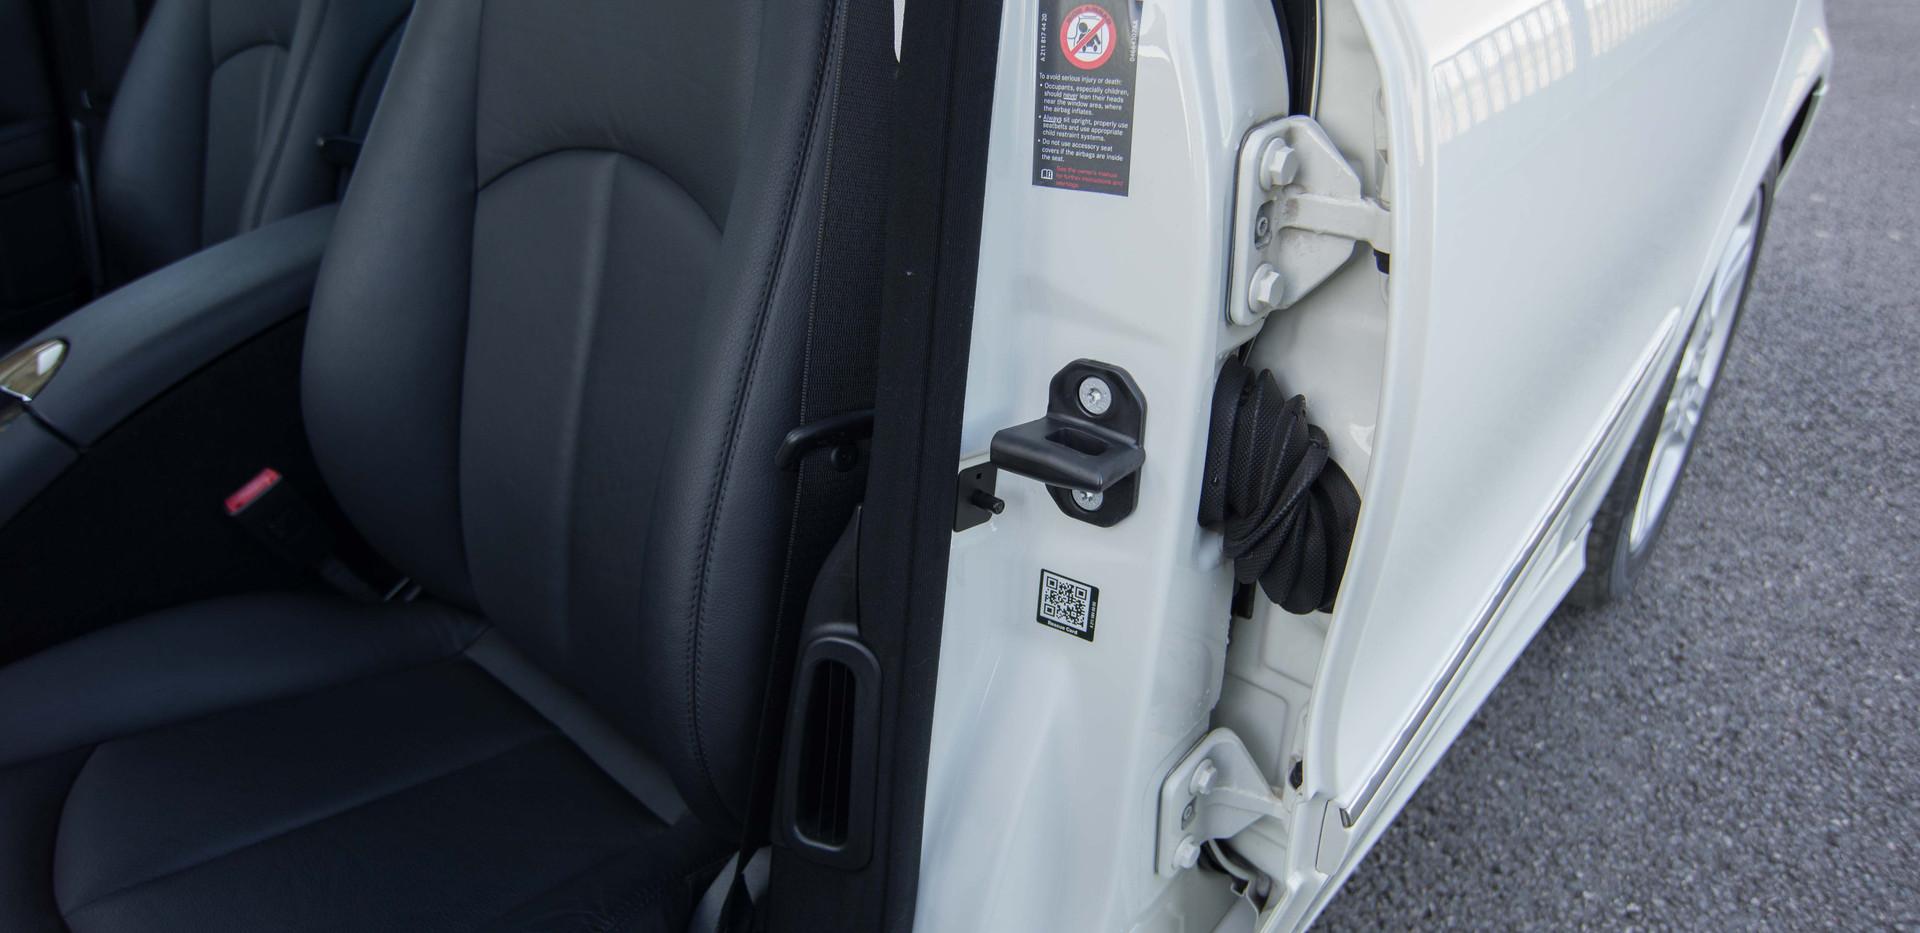 Mercedes E350 For Sale UK London  (46 of